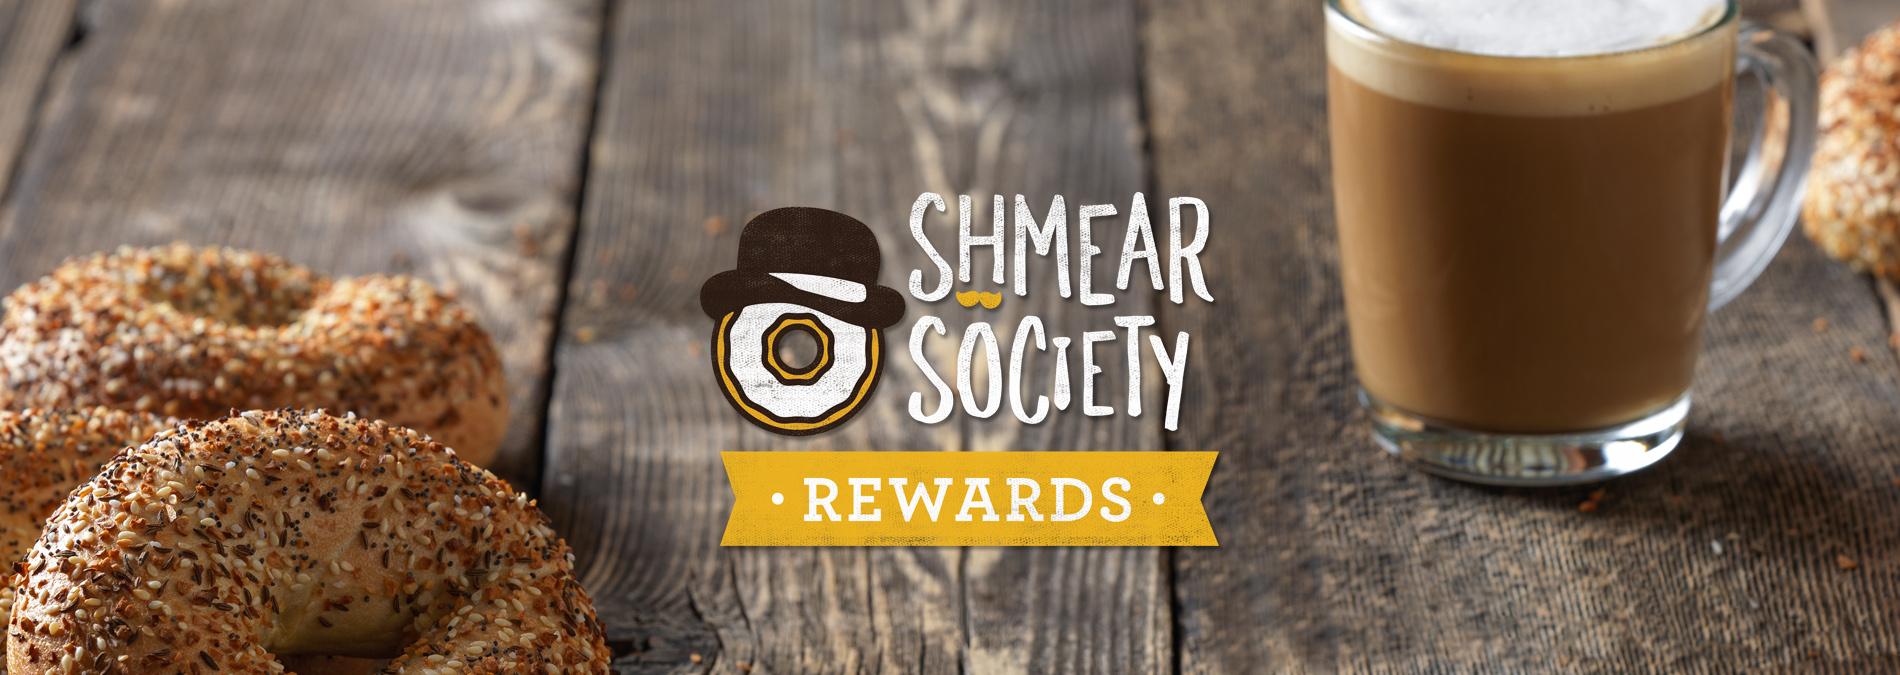 Shmear Society Rewards